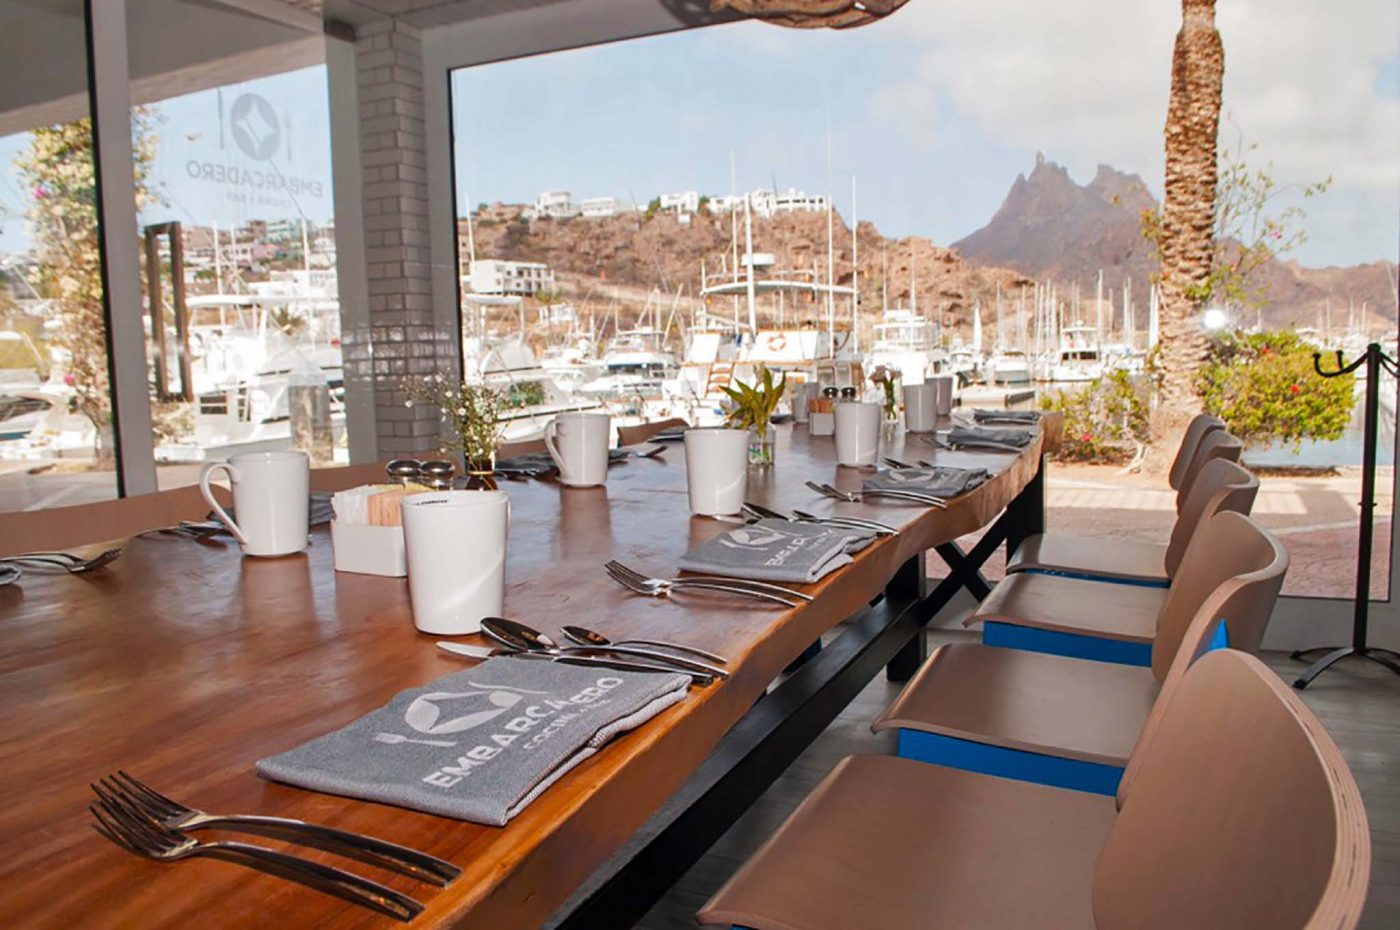 Embarcadero Cocina + Bar